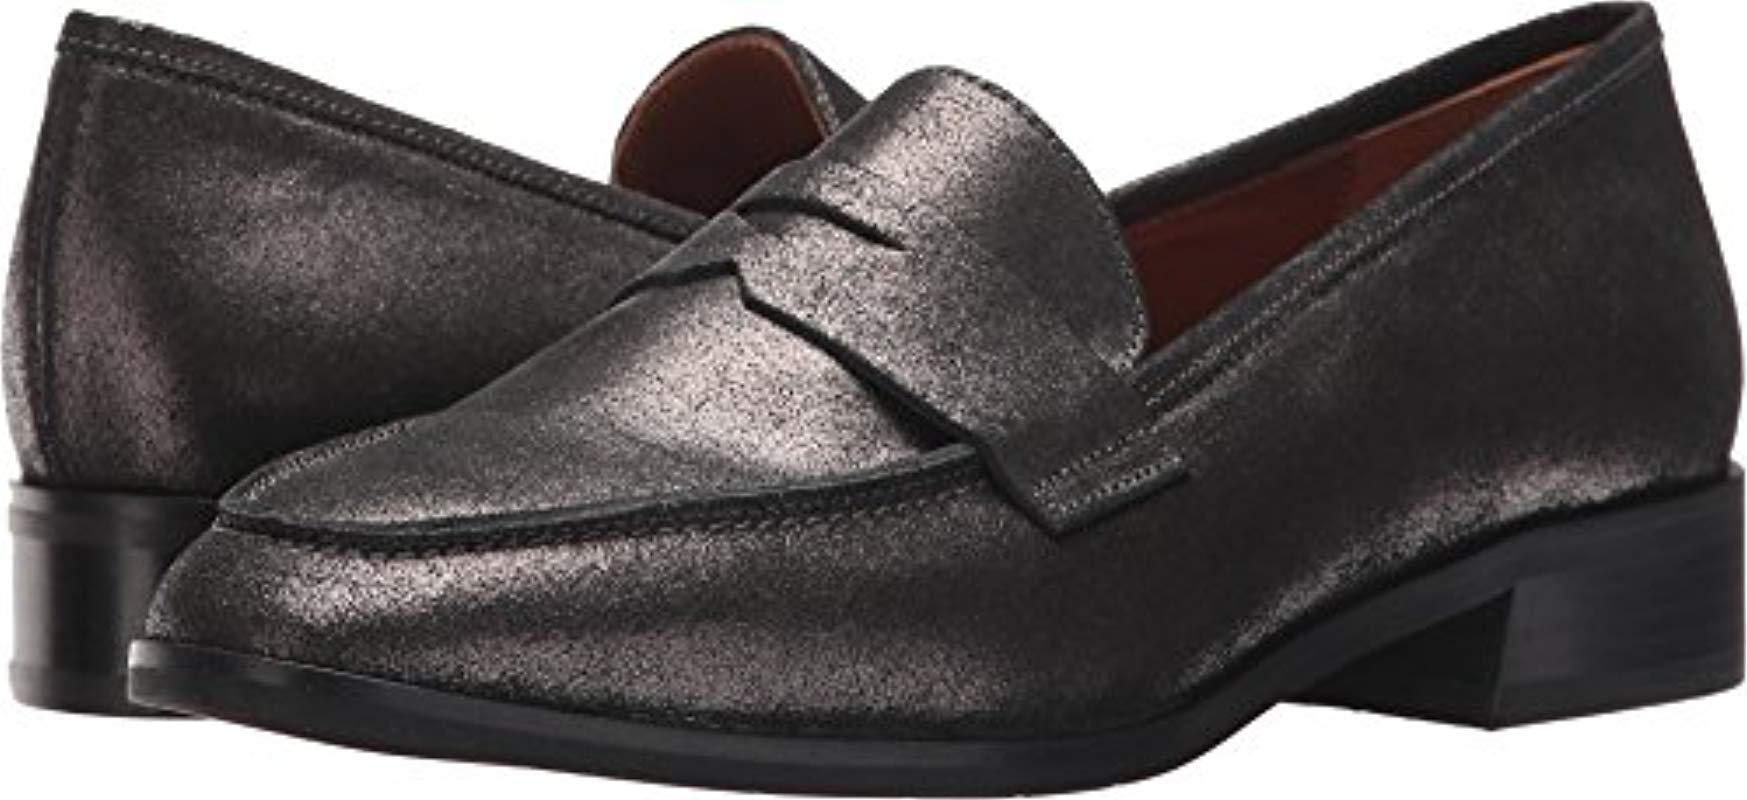 fc61a947db3 Lyst - Aquatalia Aquatalia Sharon Pebbled Suede Slip-on Loafer